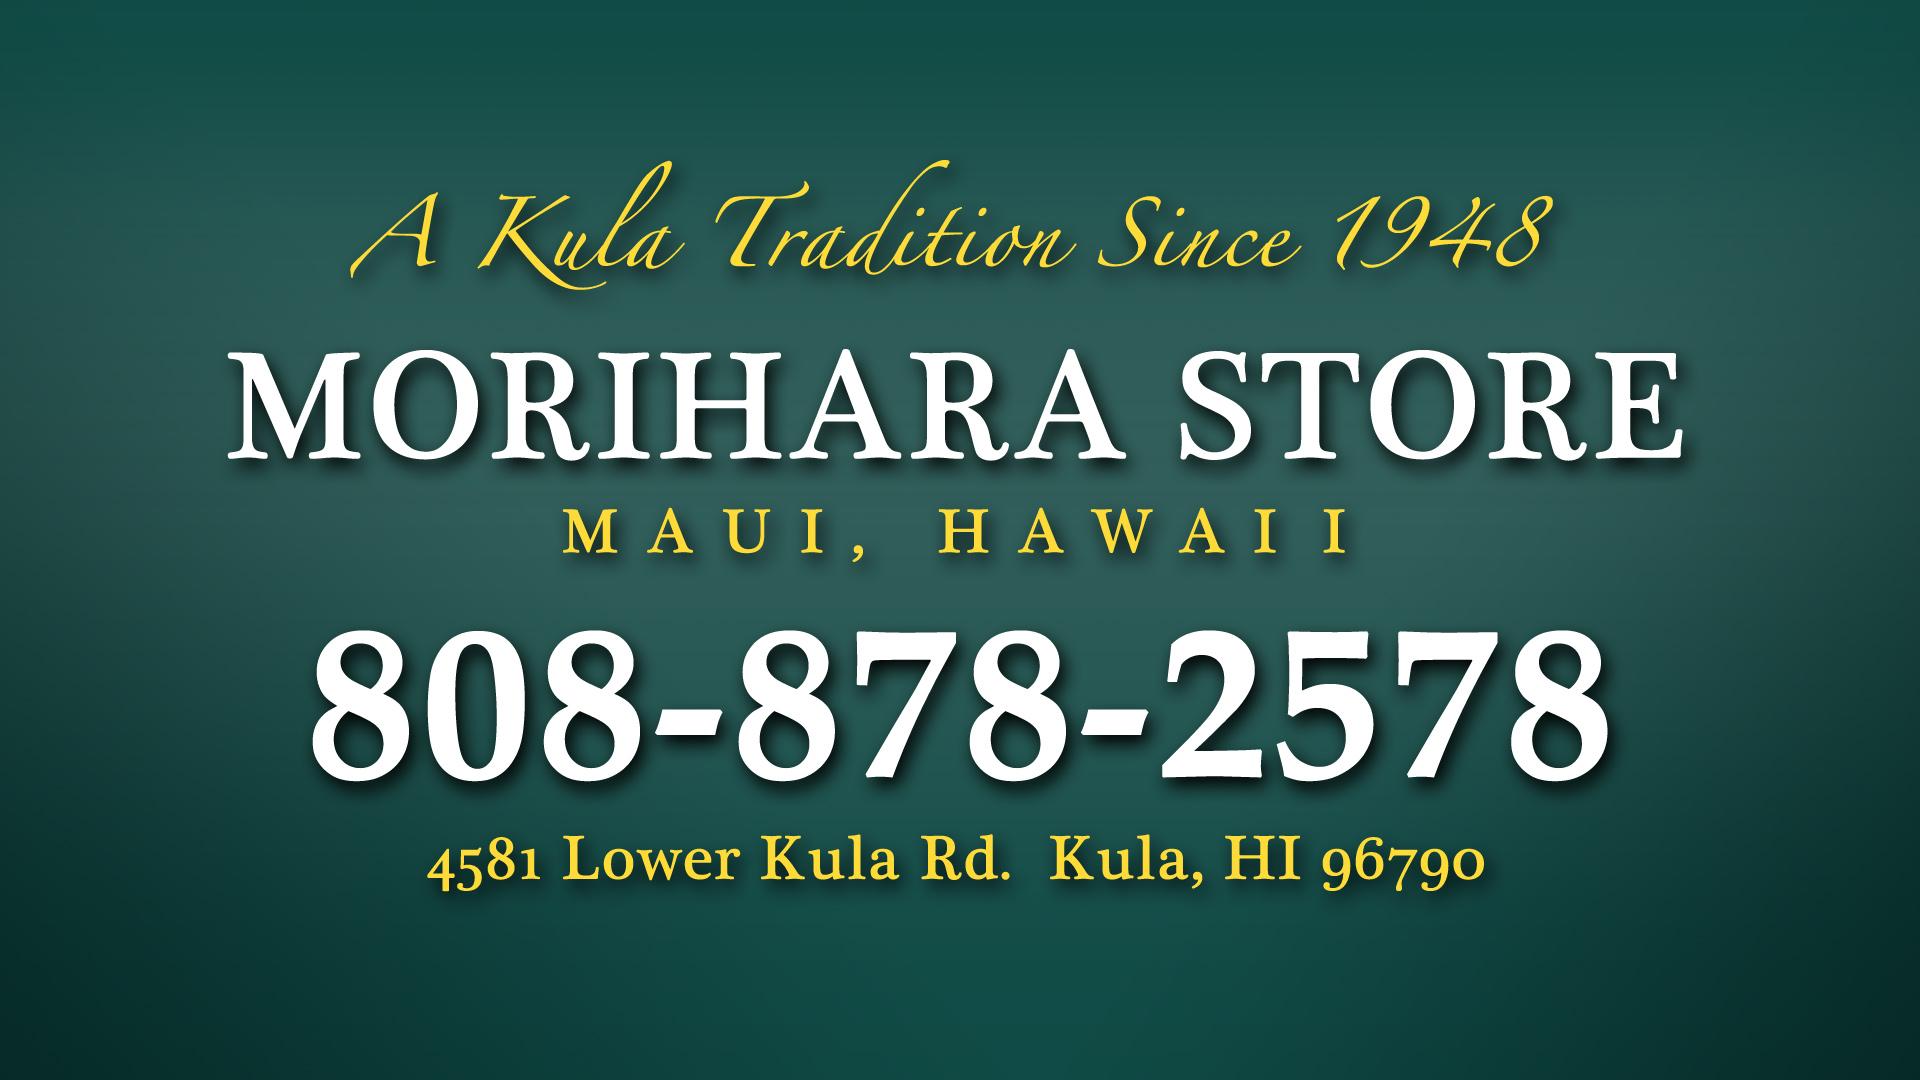 Morihara Store Maui